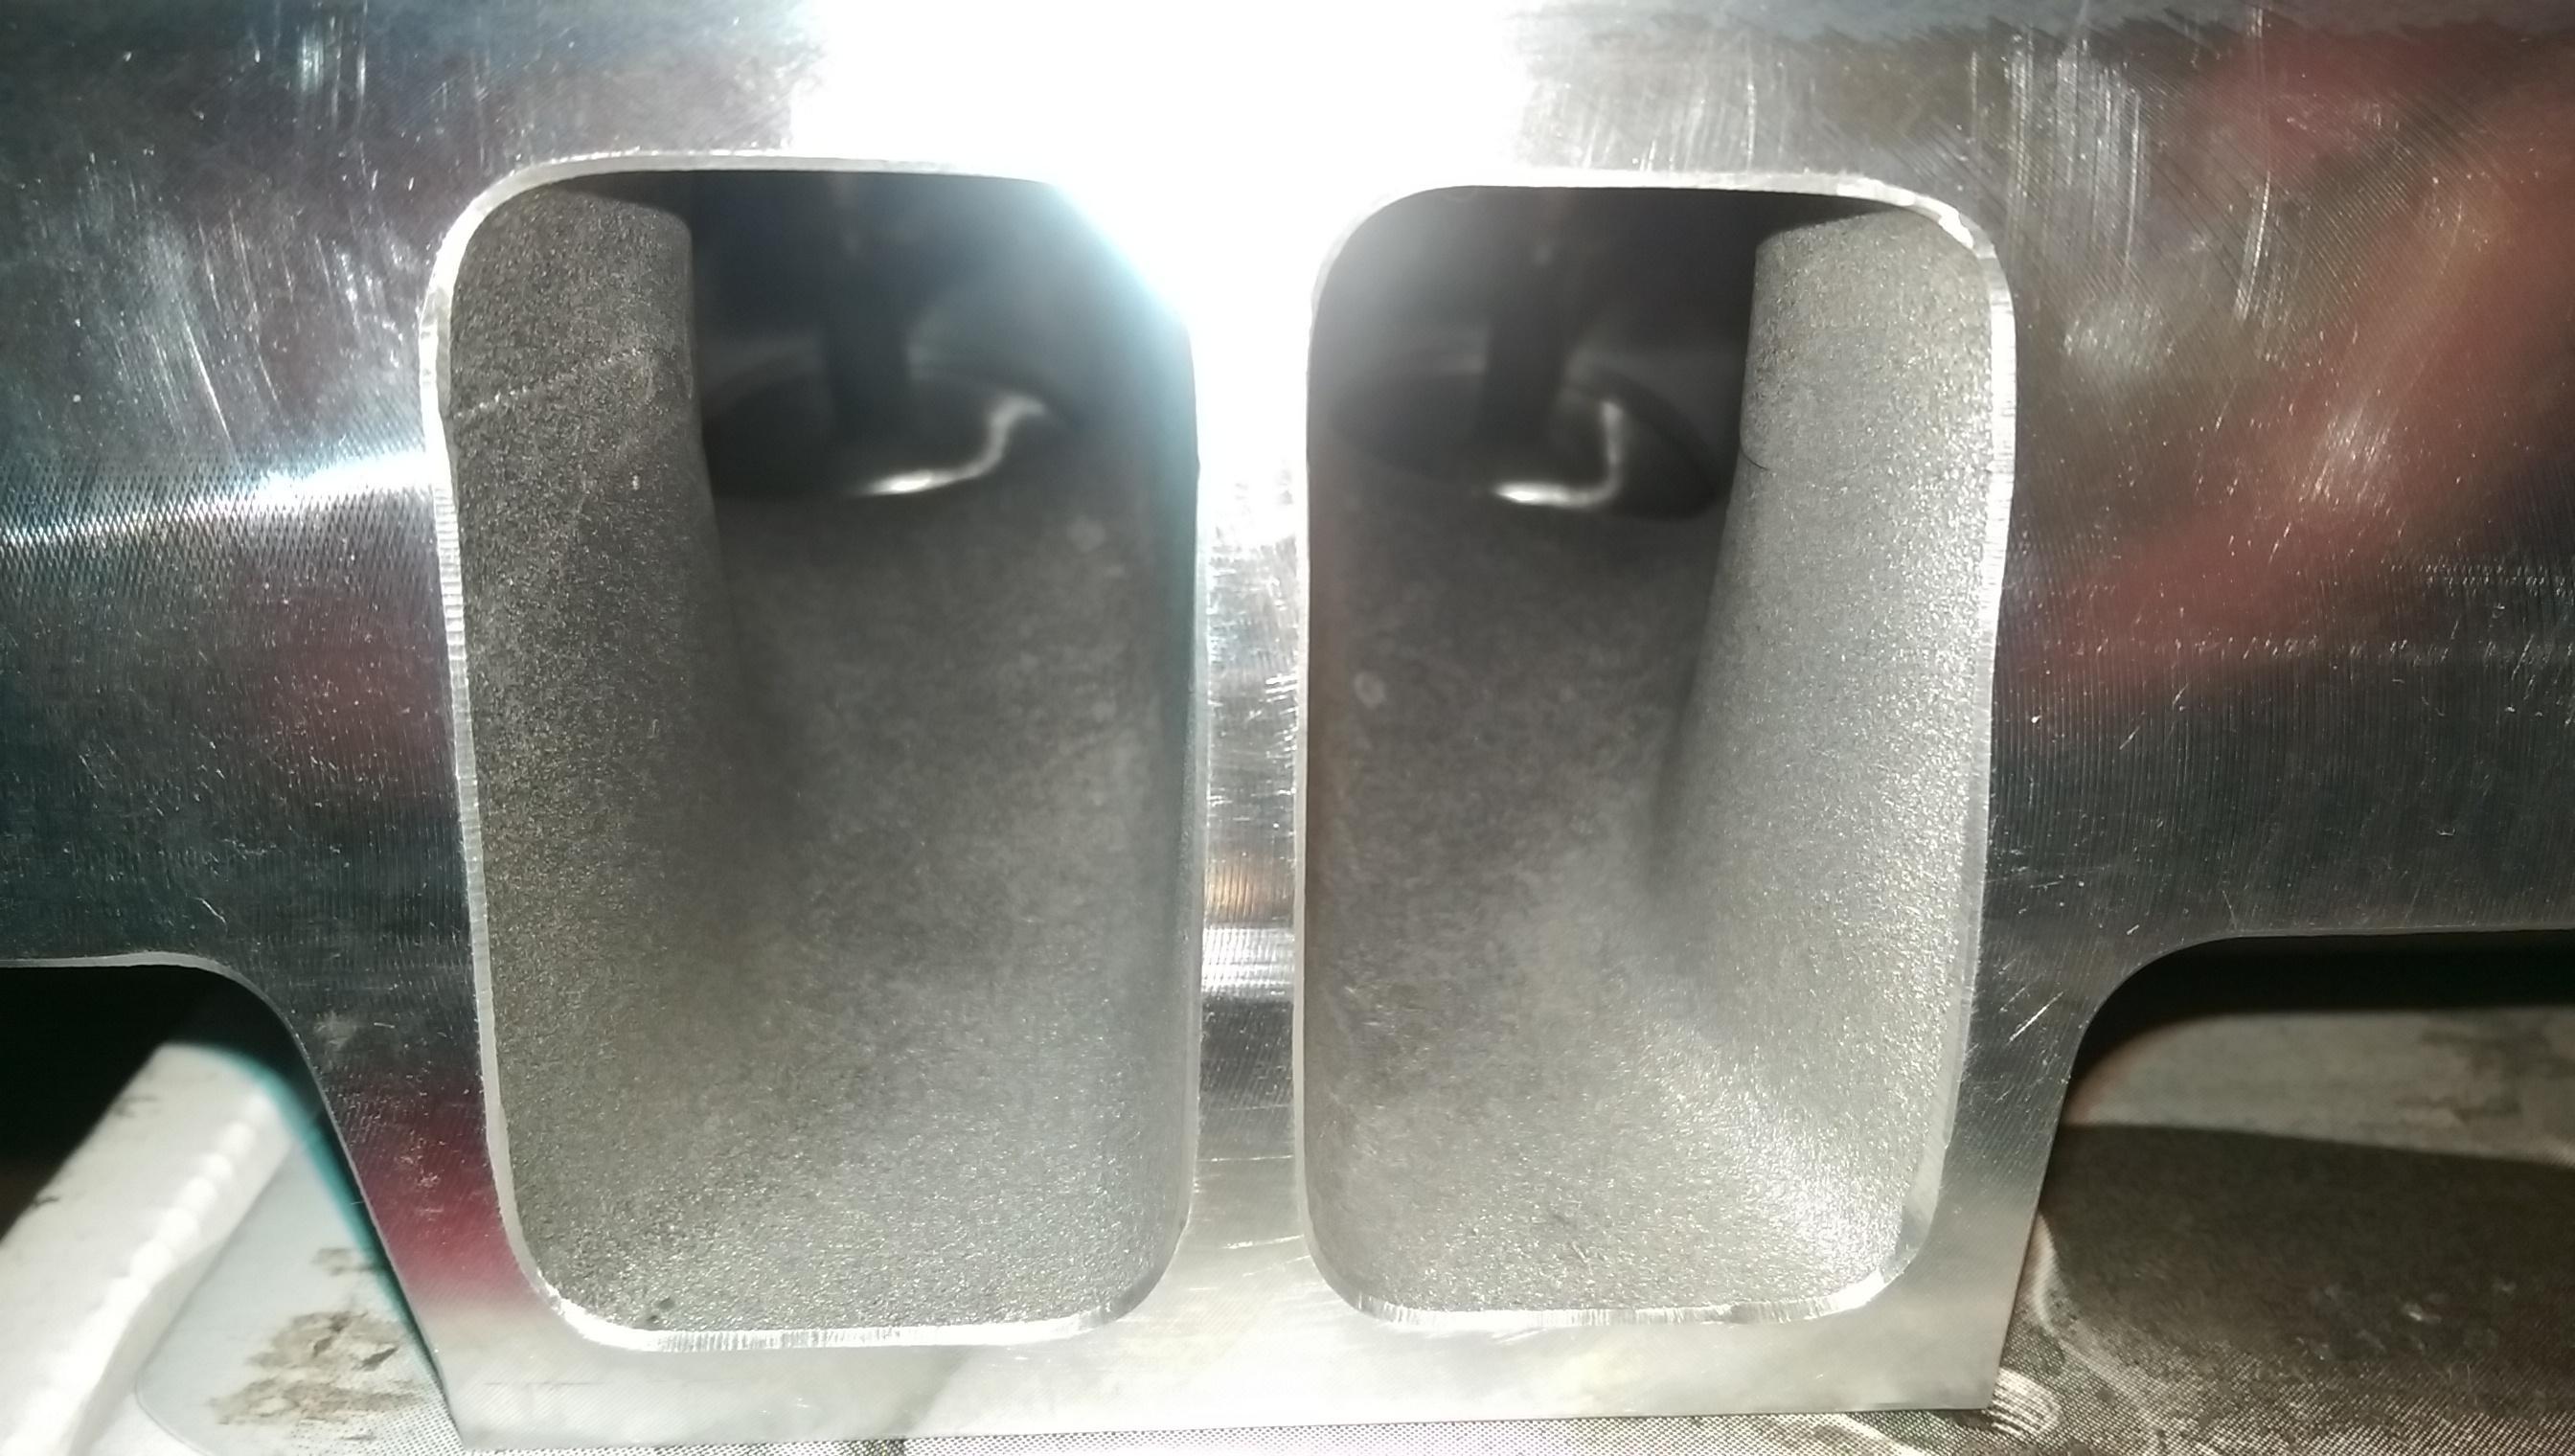 My ProMaxx Maxx 200cc sbc heads arrived - Hot Rod Forum : Hotrodders